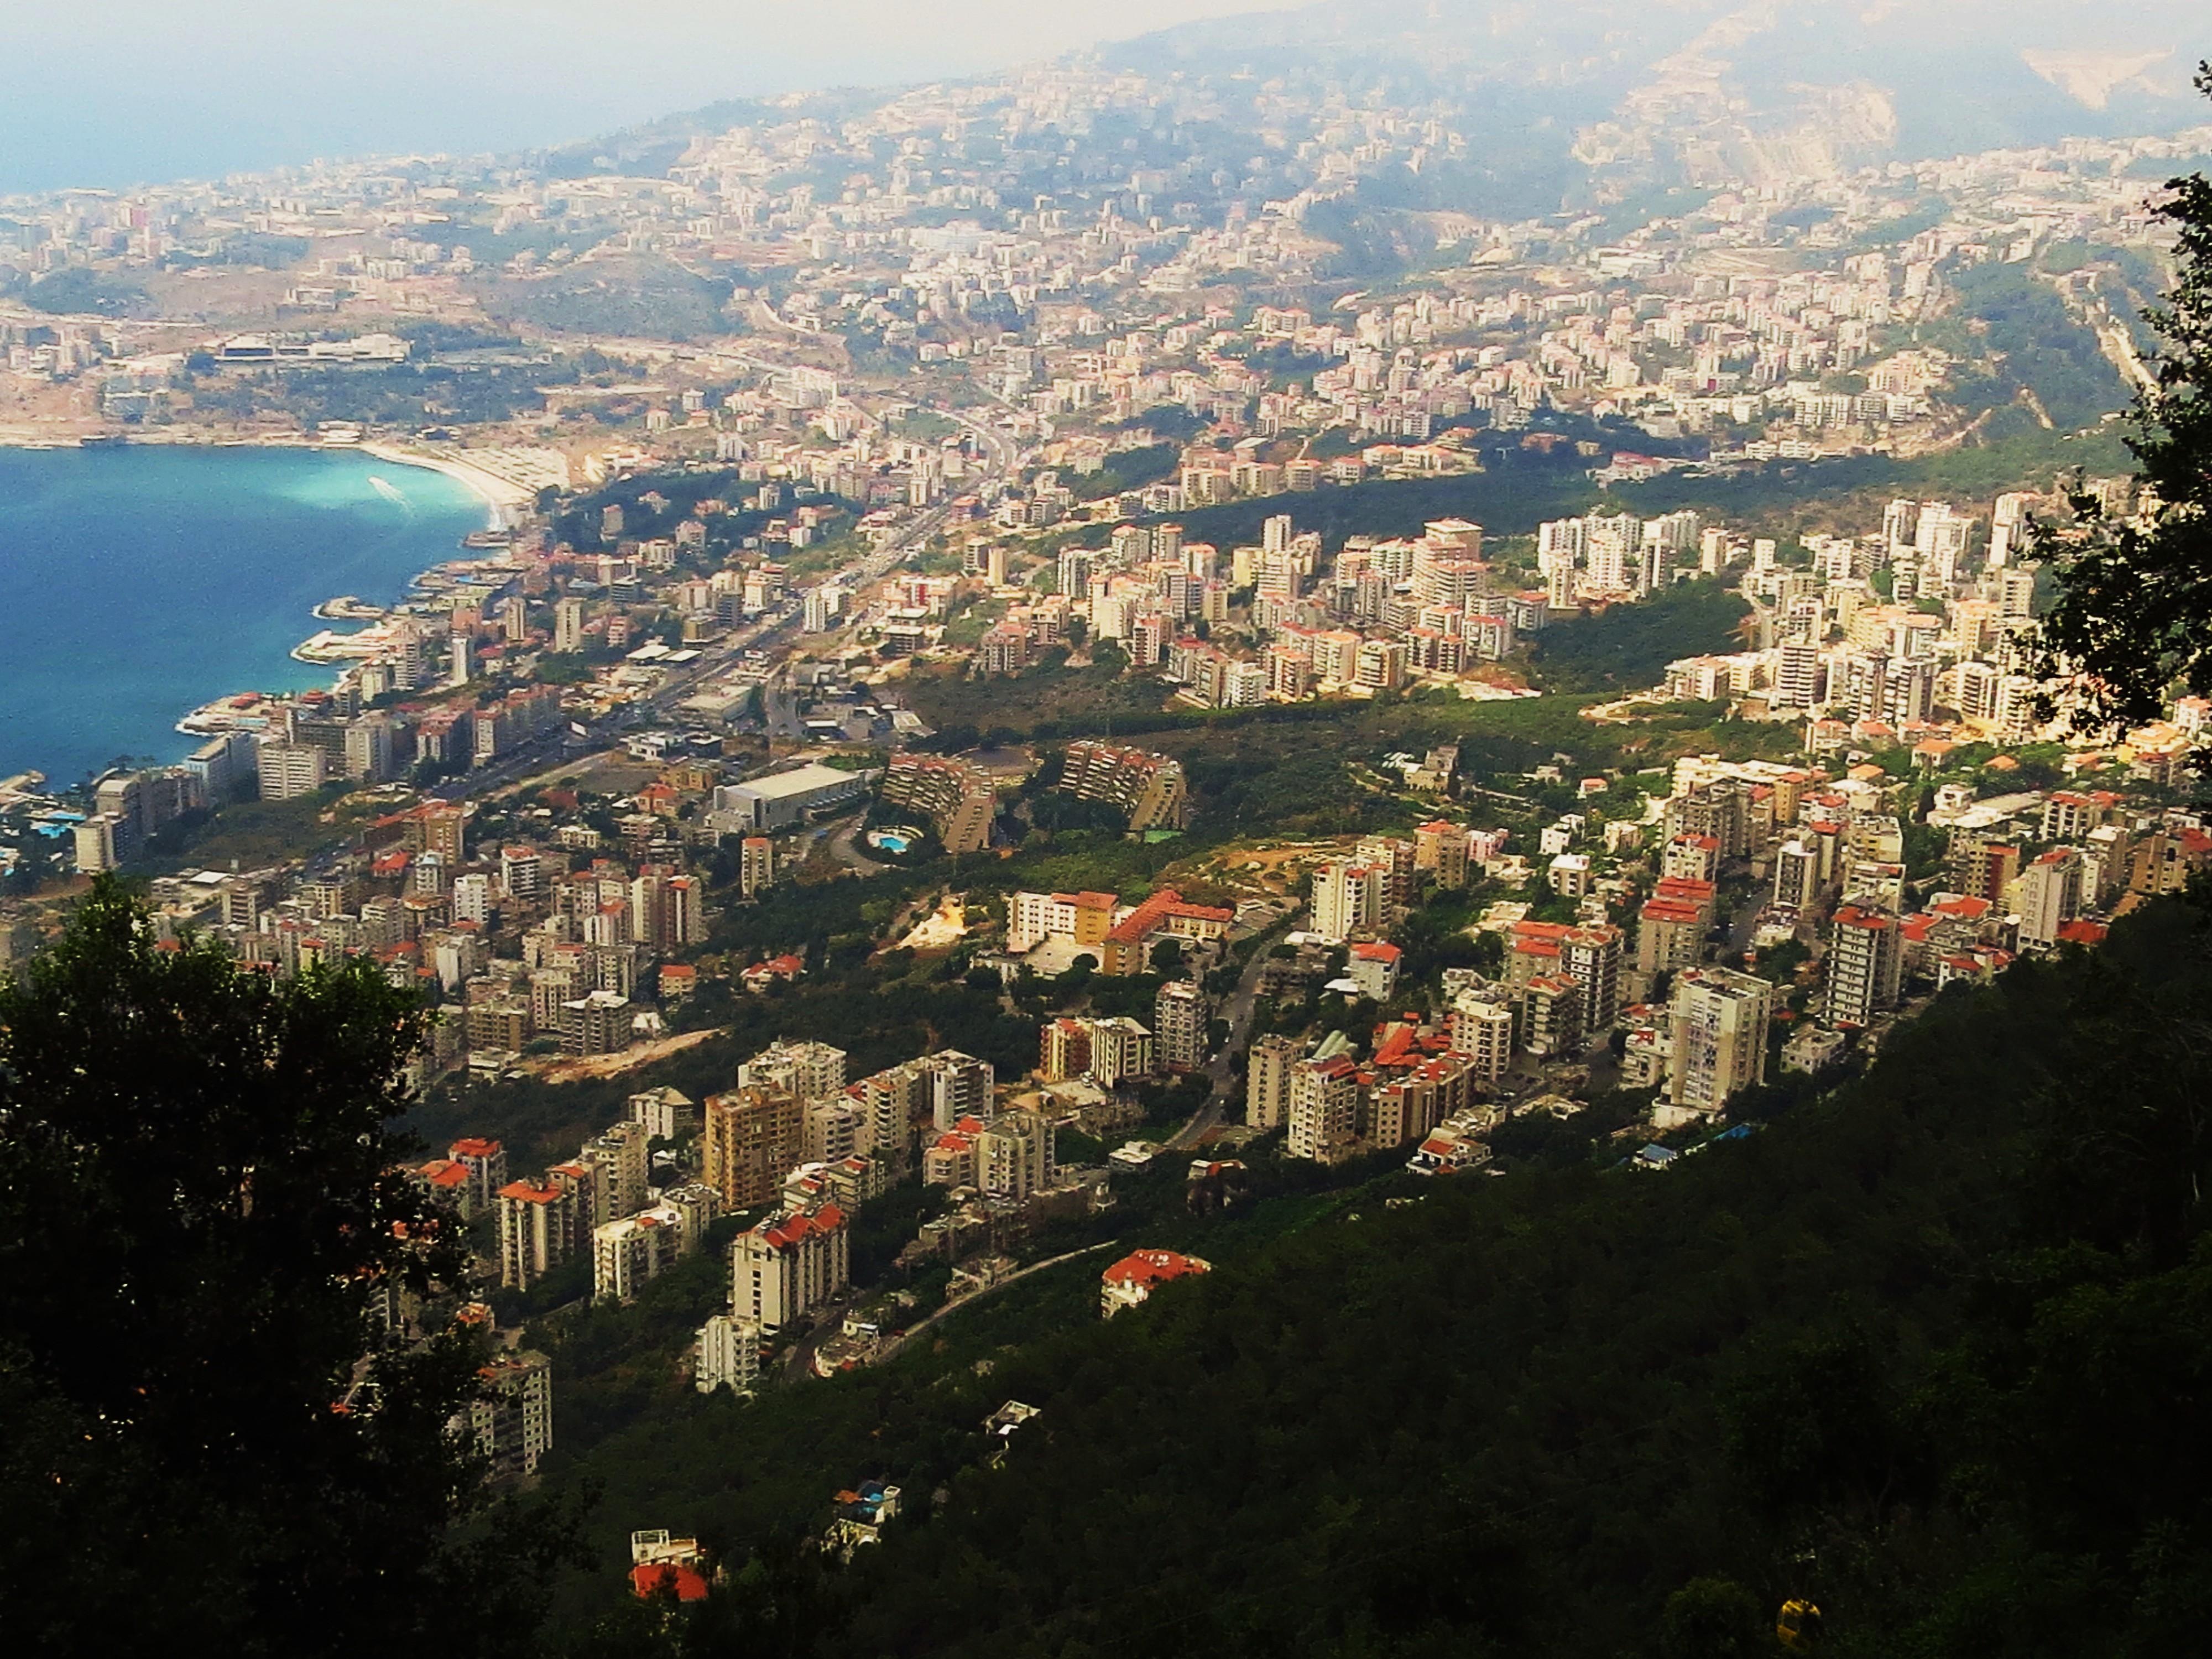 lebanon - photo #43